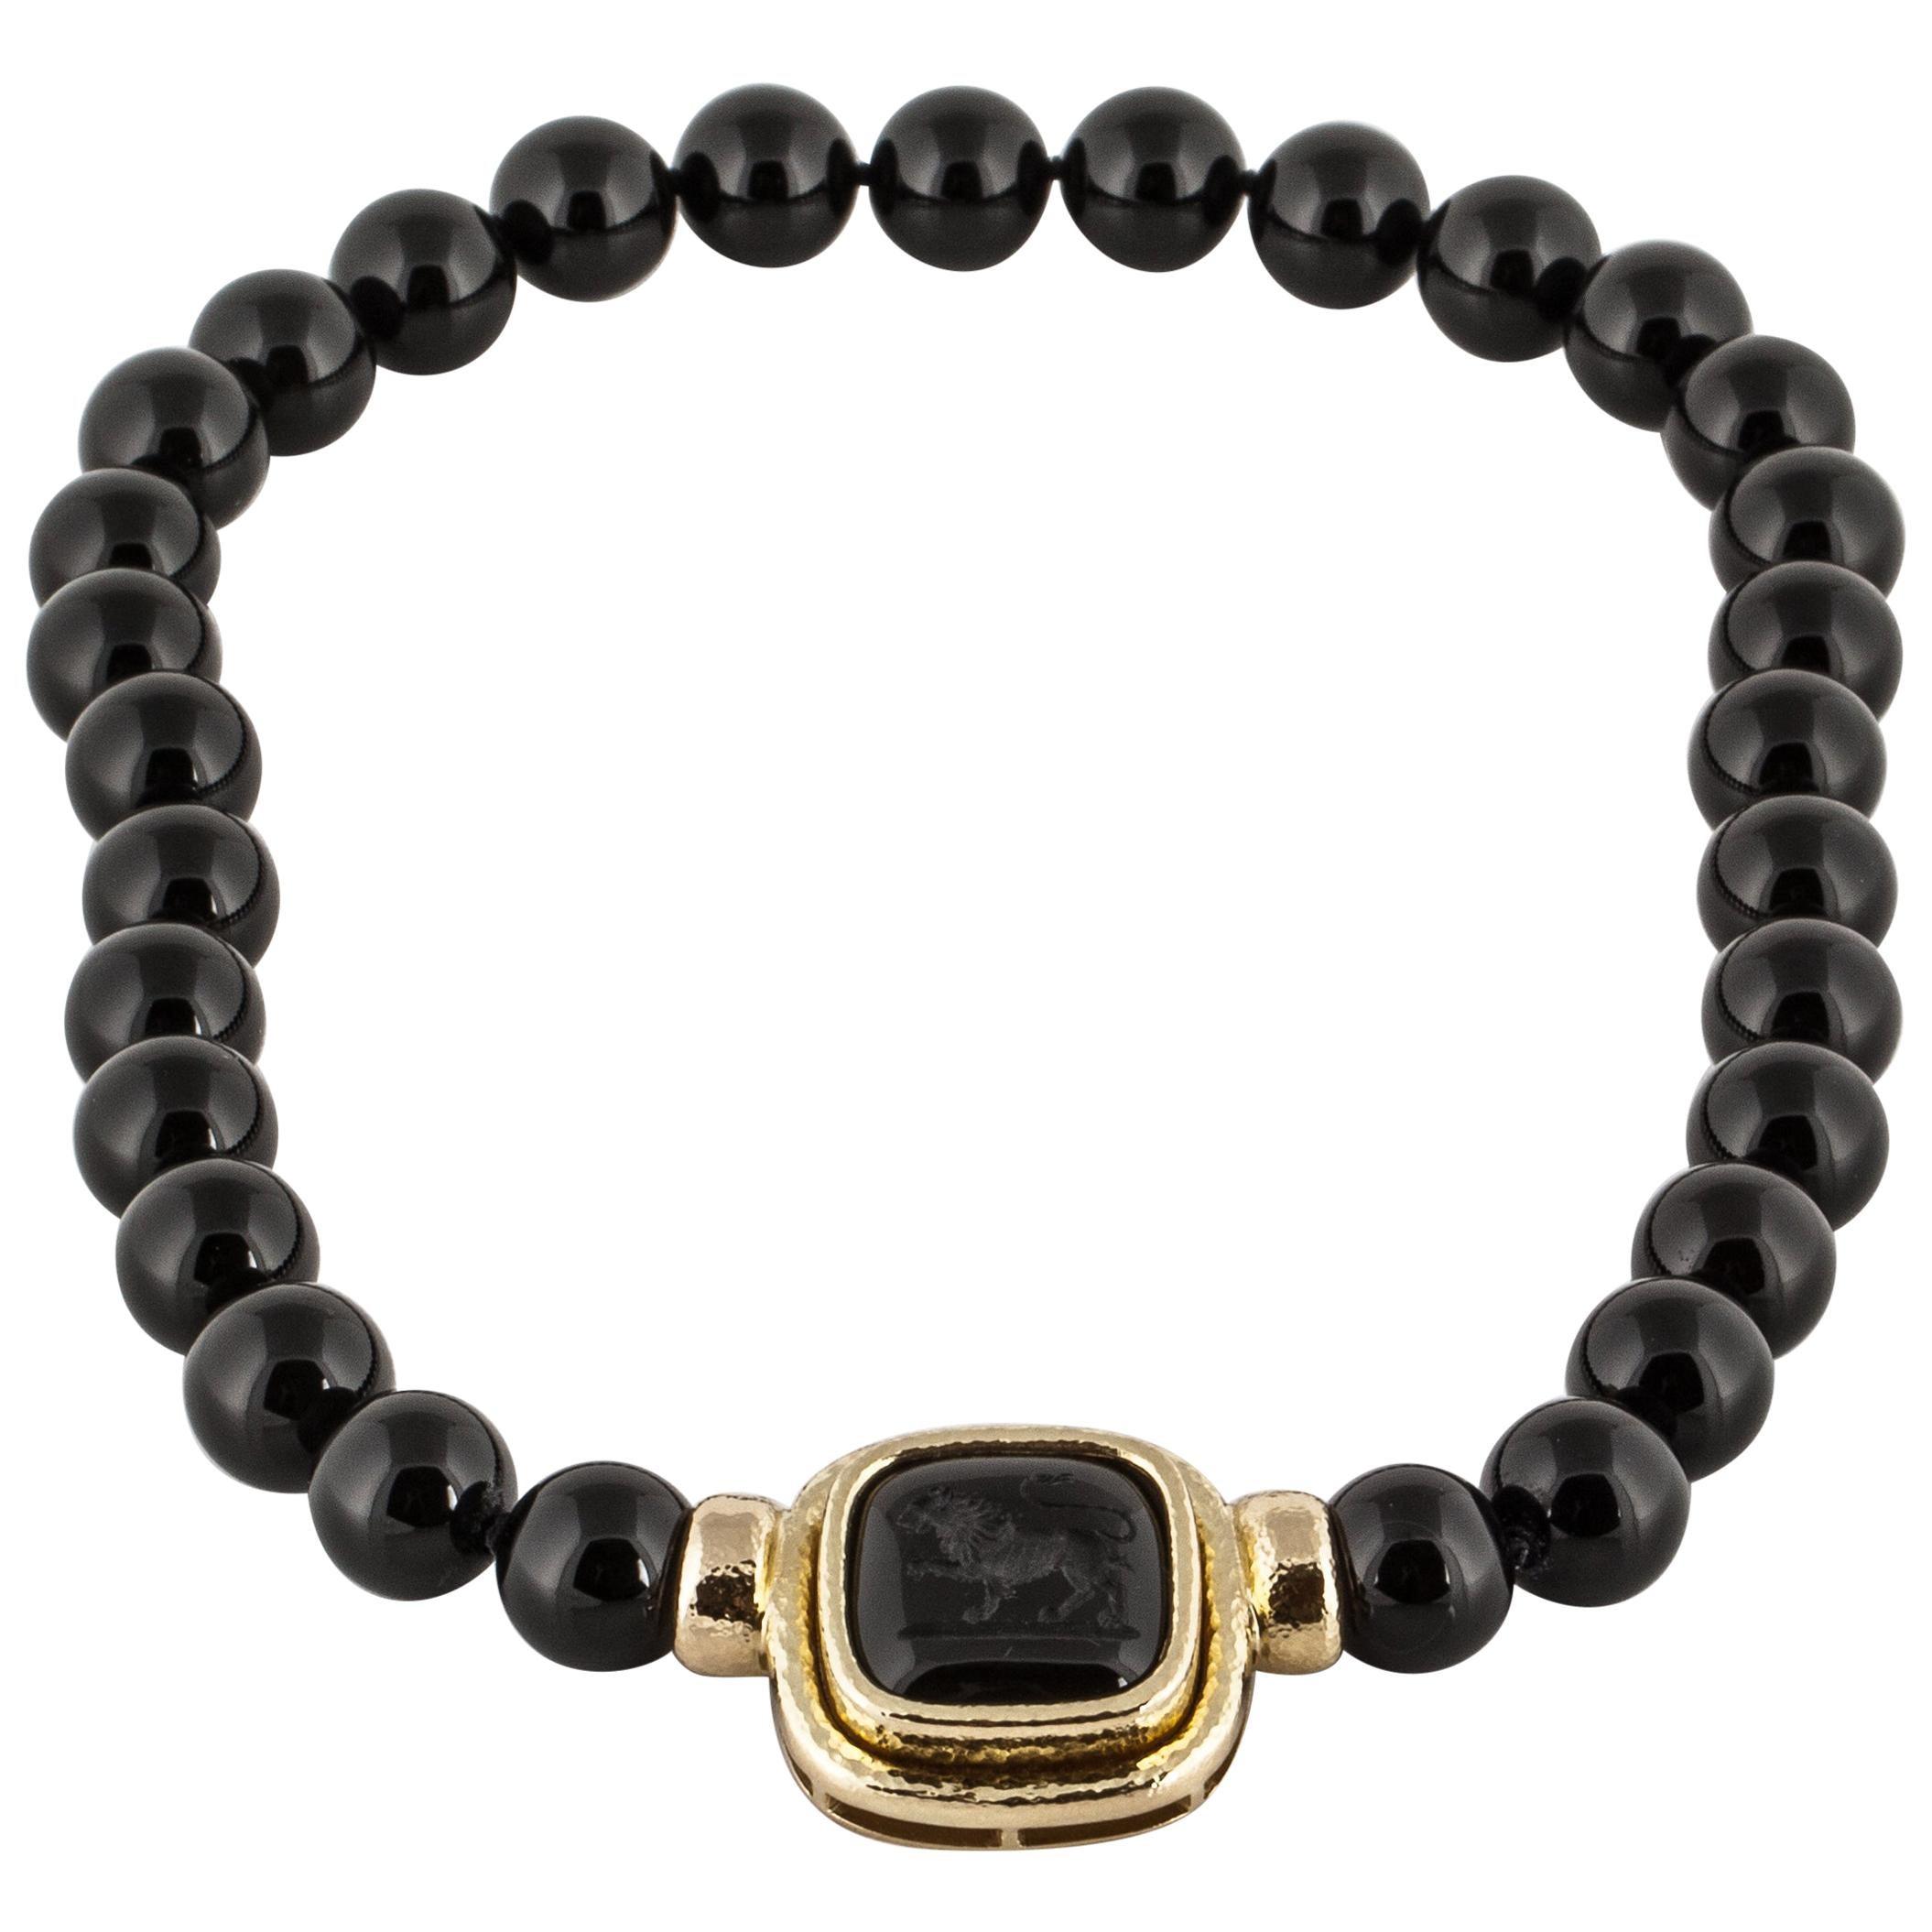 Elizabeth Locke Onyx Bead Necklace with Intaglio